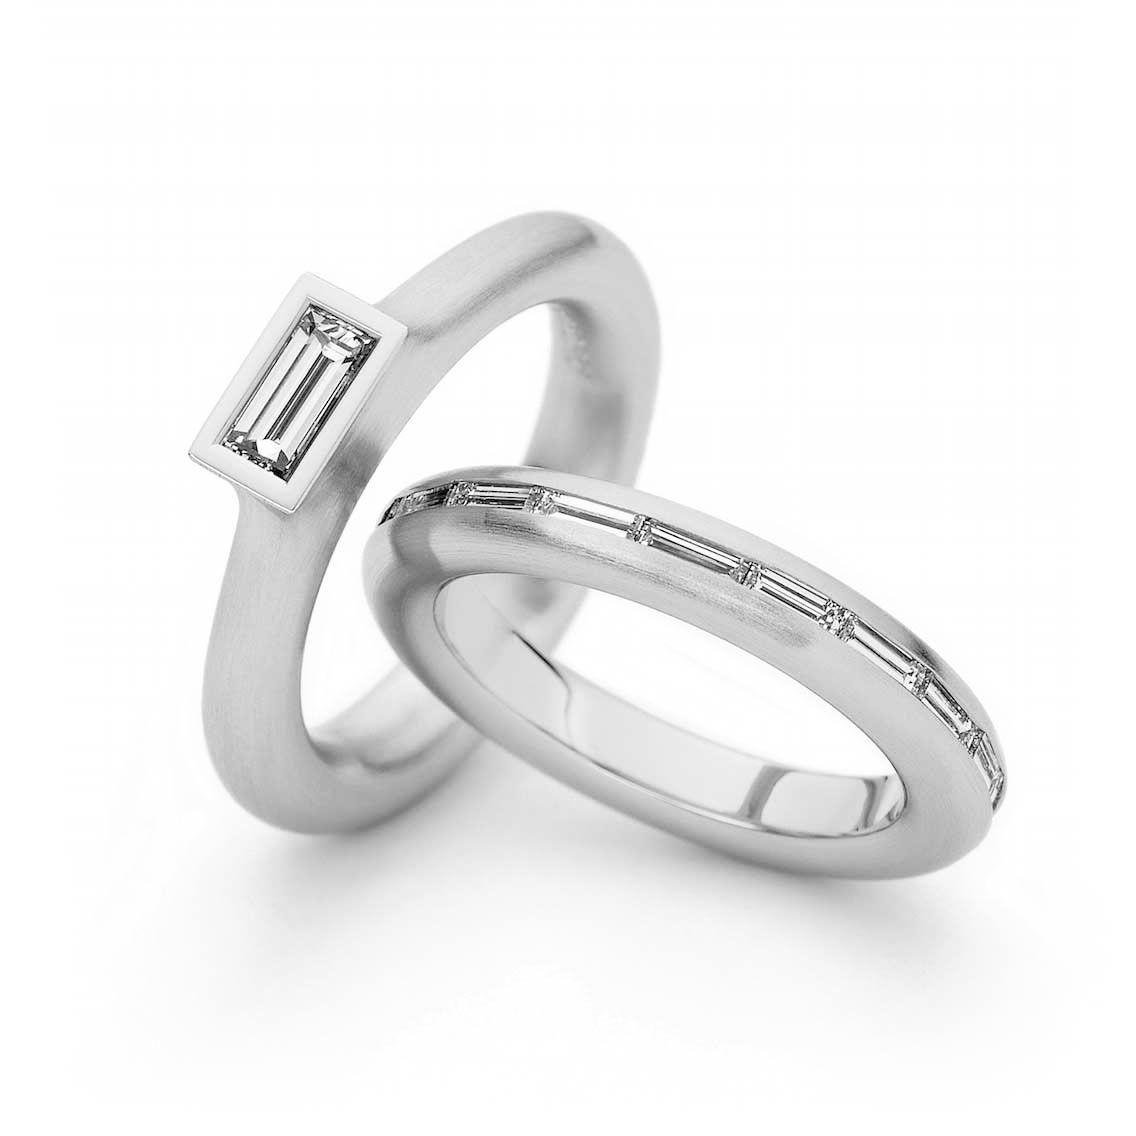 Henrich & Denzel - Toska Baguette Engagement Ring - ORRO contemporary Jewellery  Glasgow - Platinum Engagement